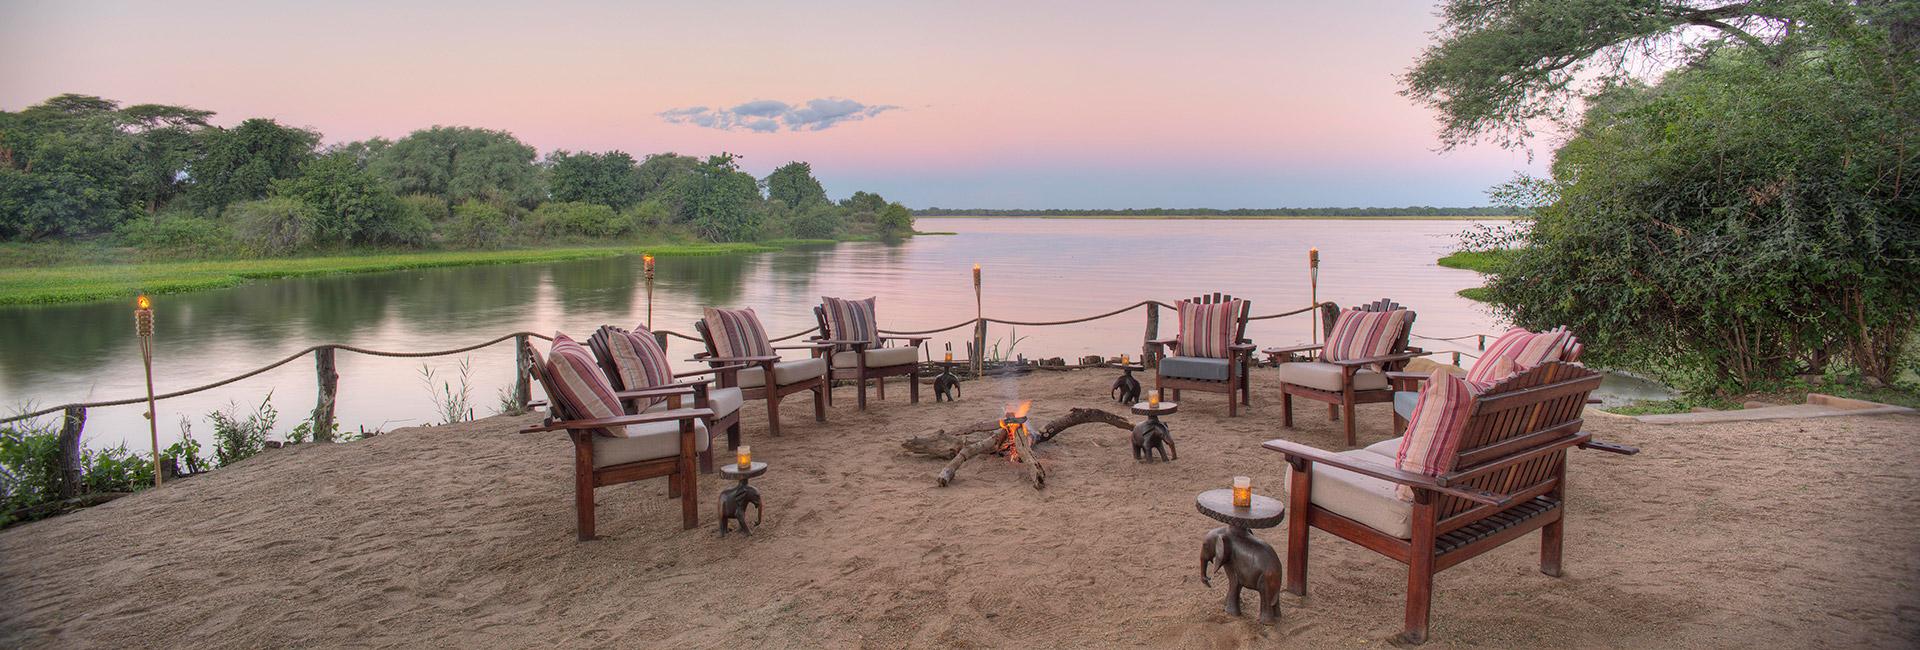 Chongwe Zambia - A tranquility like no other